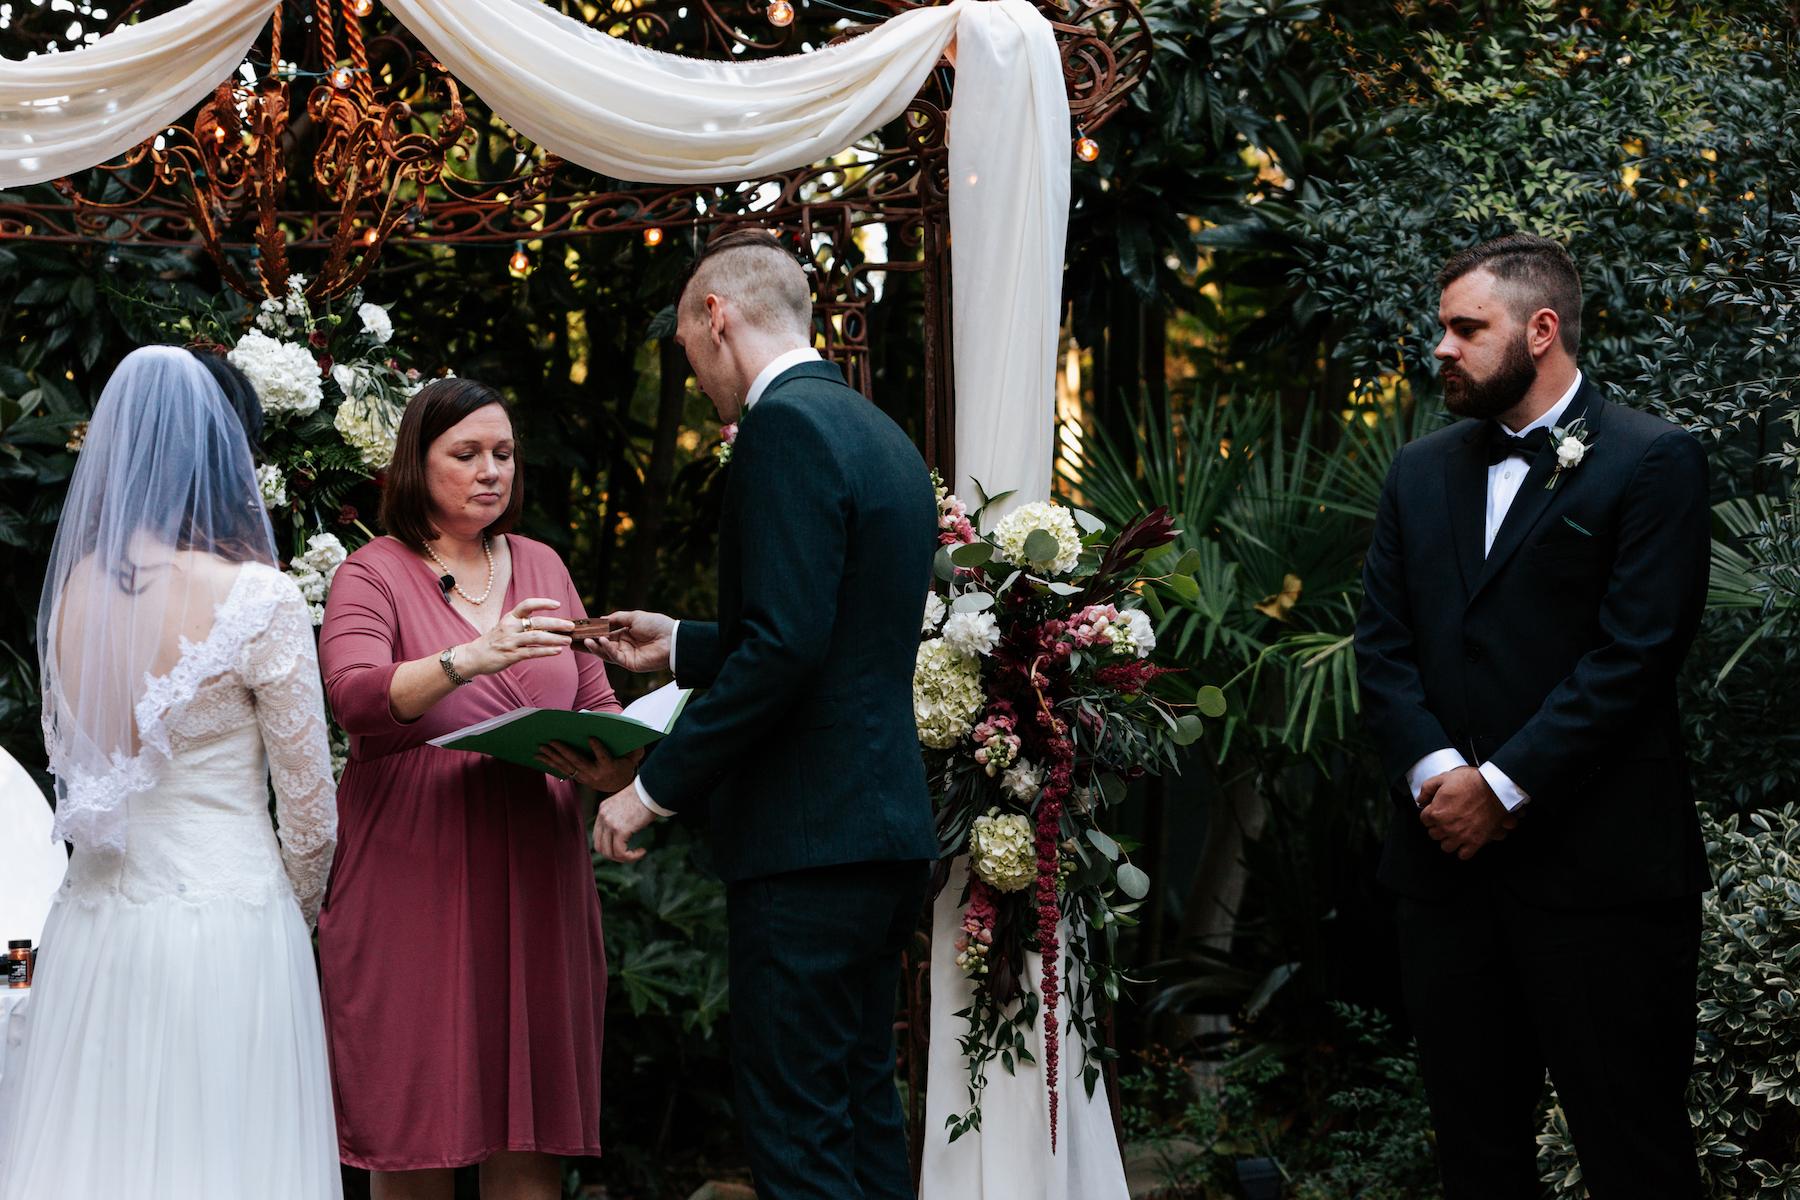 South-Carolina-Wedding-Engagement-Bridal-Photographer-Columbia-Greenville-Spartanburg-730.JPG